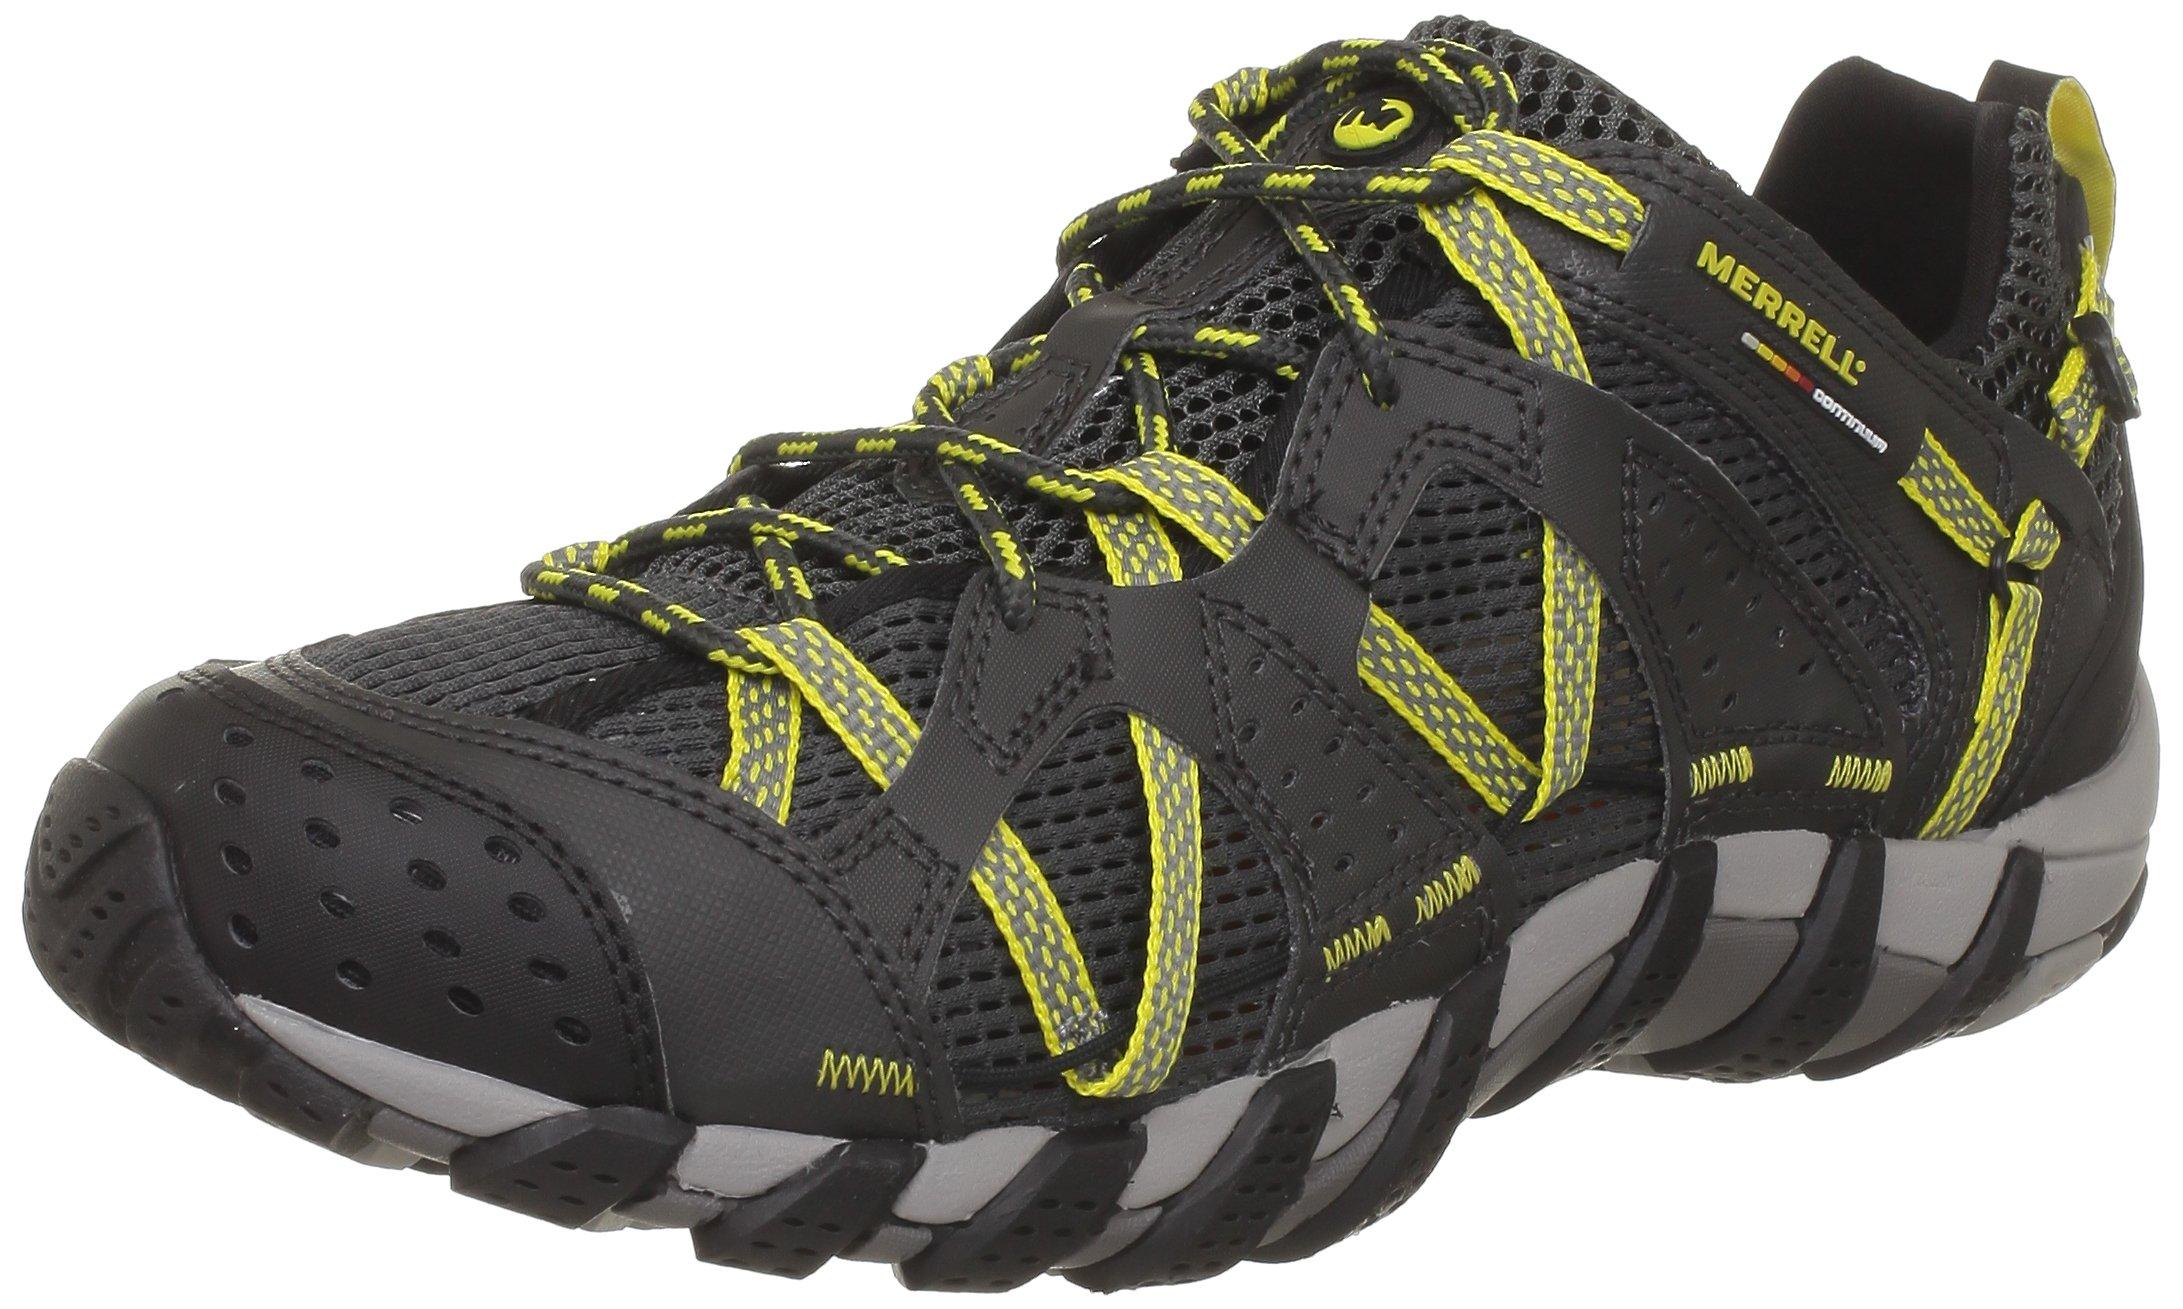 Merrell Waterpro Maipo Gentlemen Waterpro yellow/grey (Size: 43,5) watersports shoes